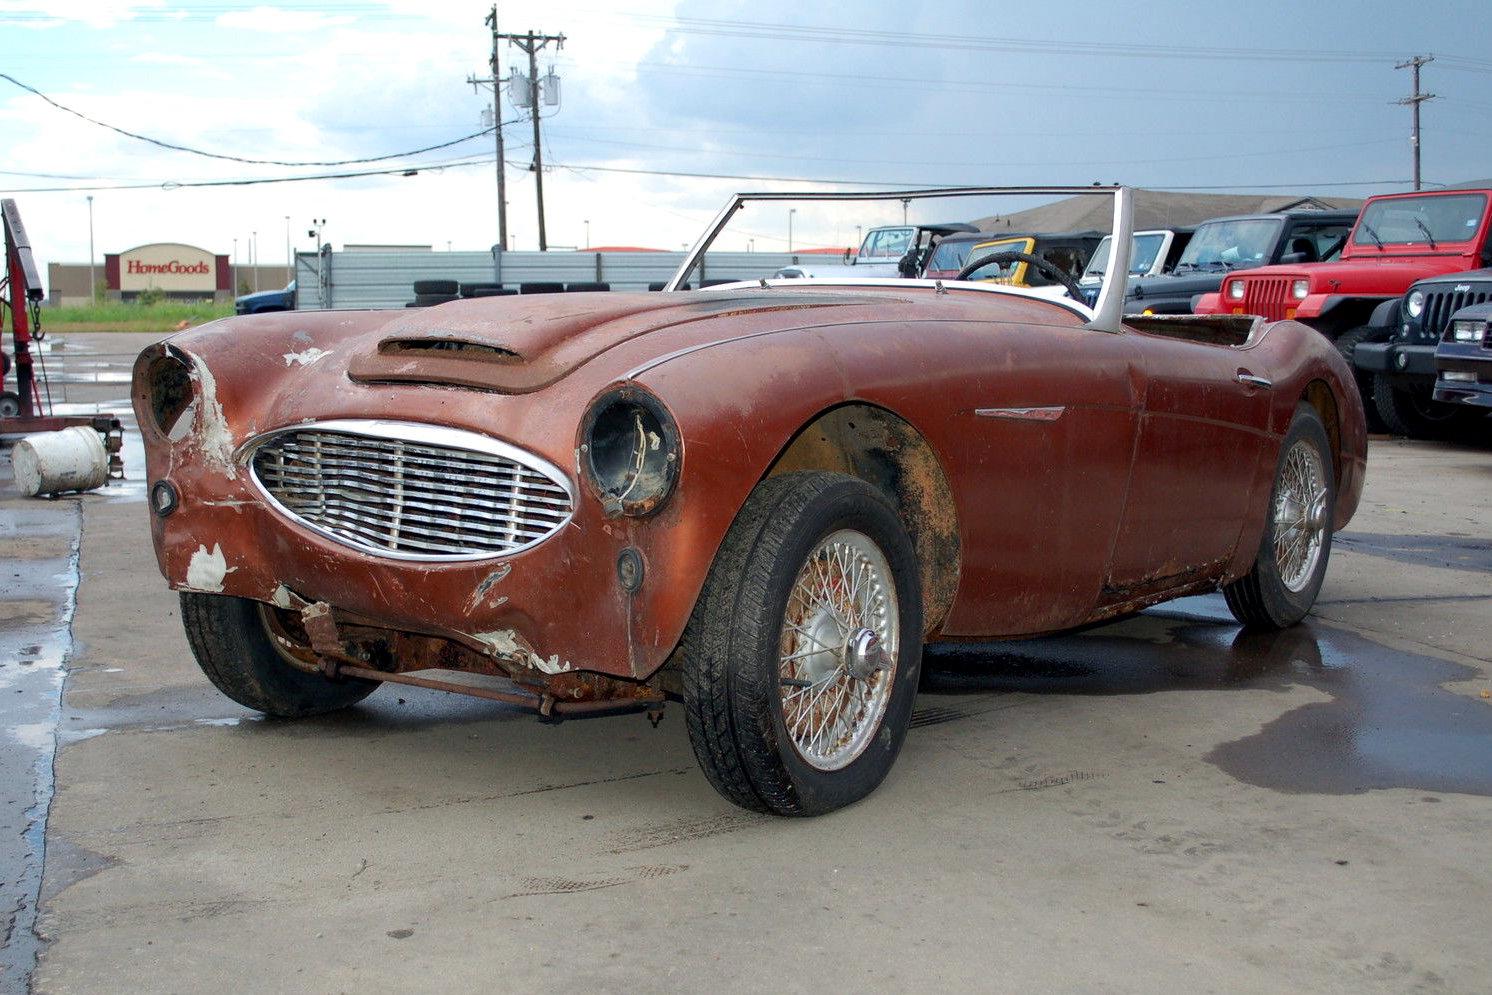 Austin Healey For Sale >> Big Project: 1959 Austin-Healey 100/6